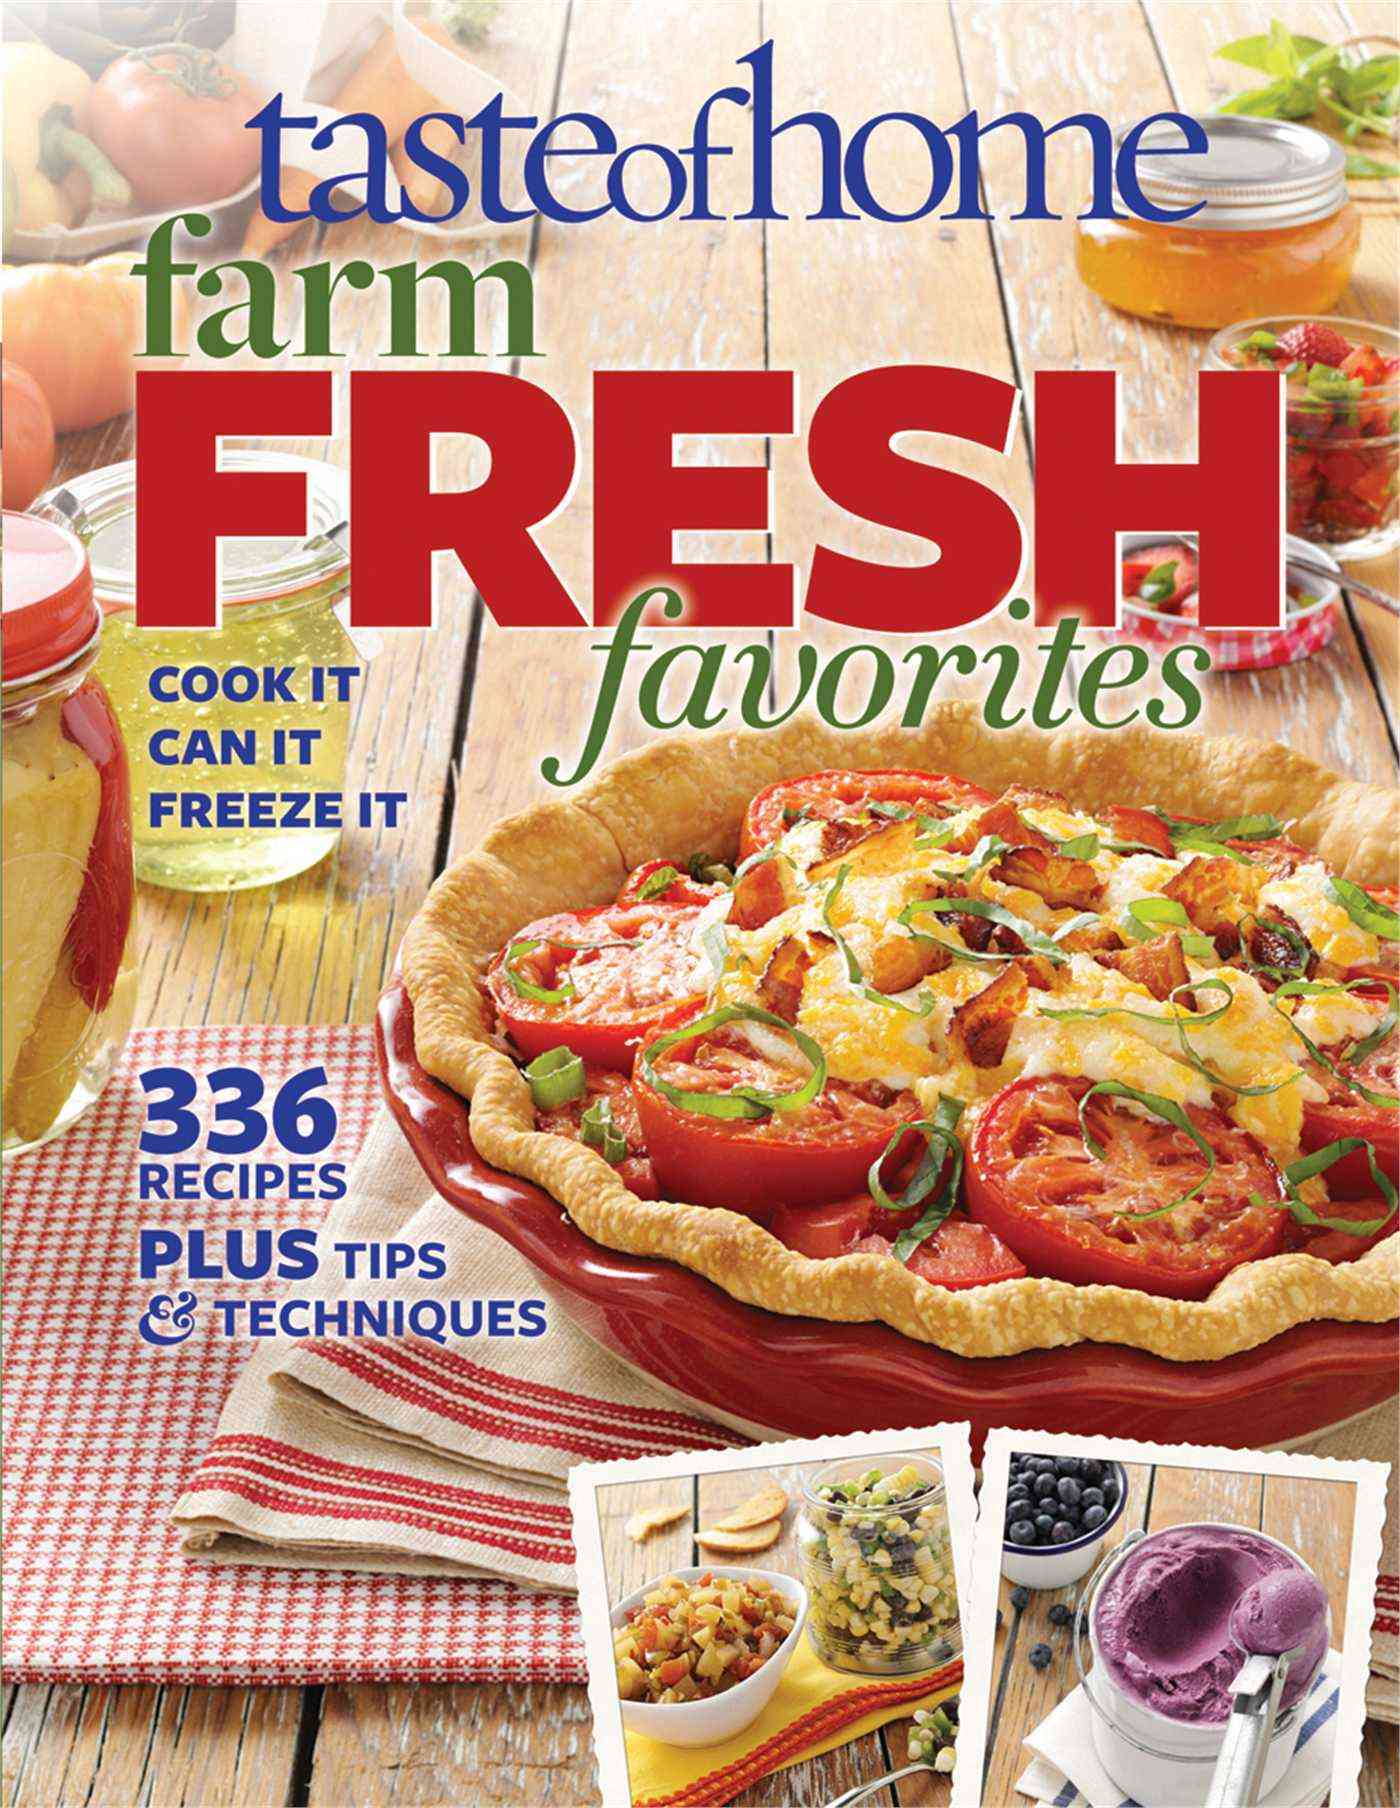 Taste of Home Farm Fresh Favorites (Paperback)